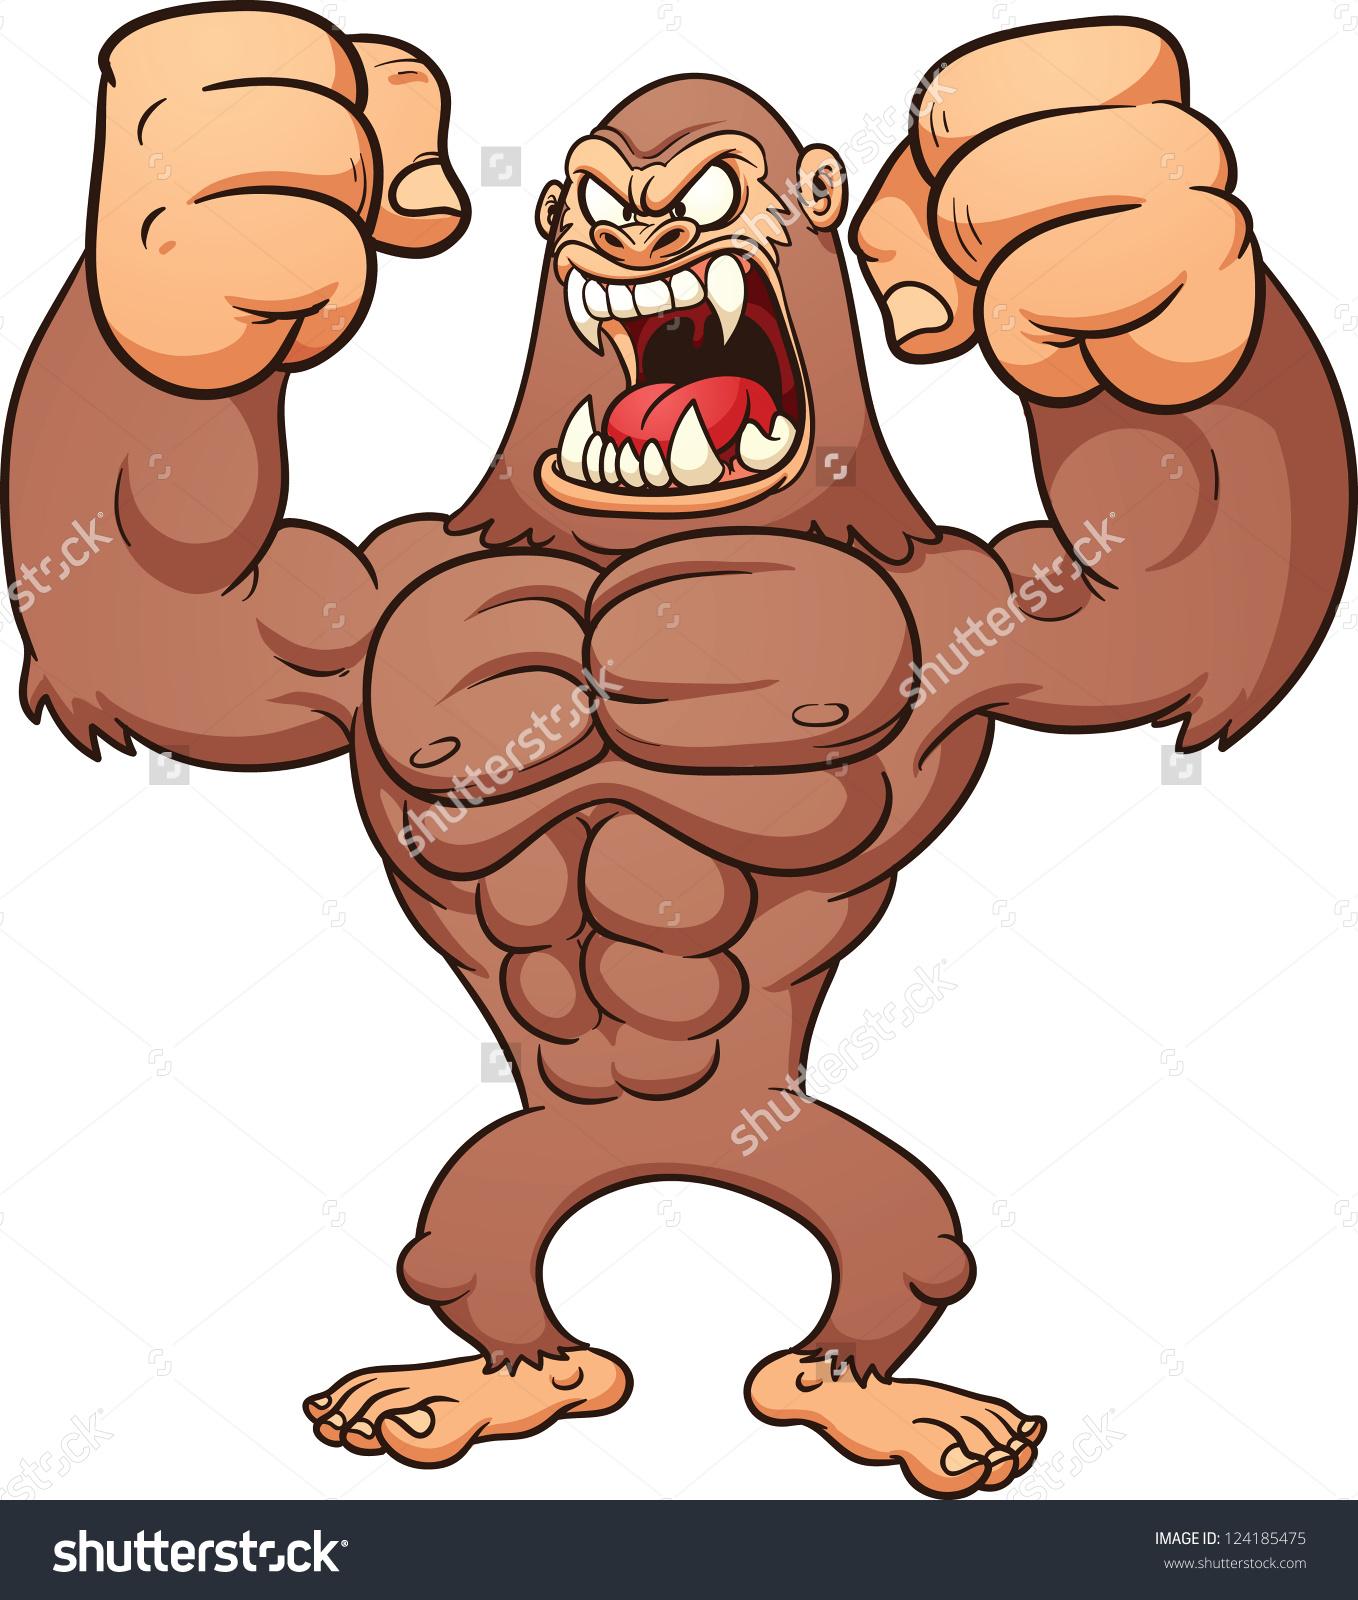 Angry Bigfoot Vector Clip Art Illustration Stock Vector 124185475.